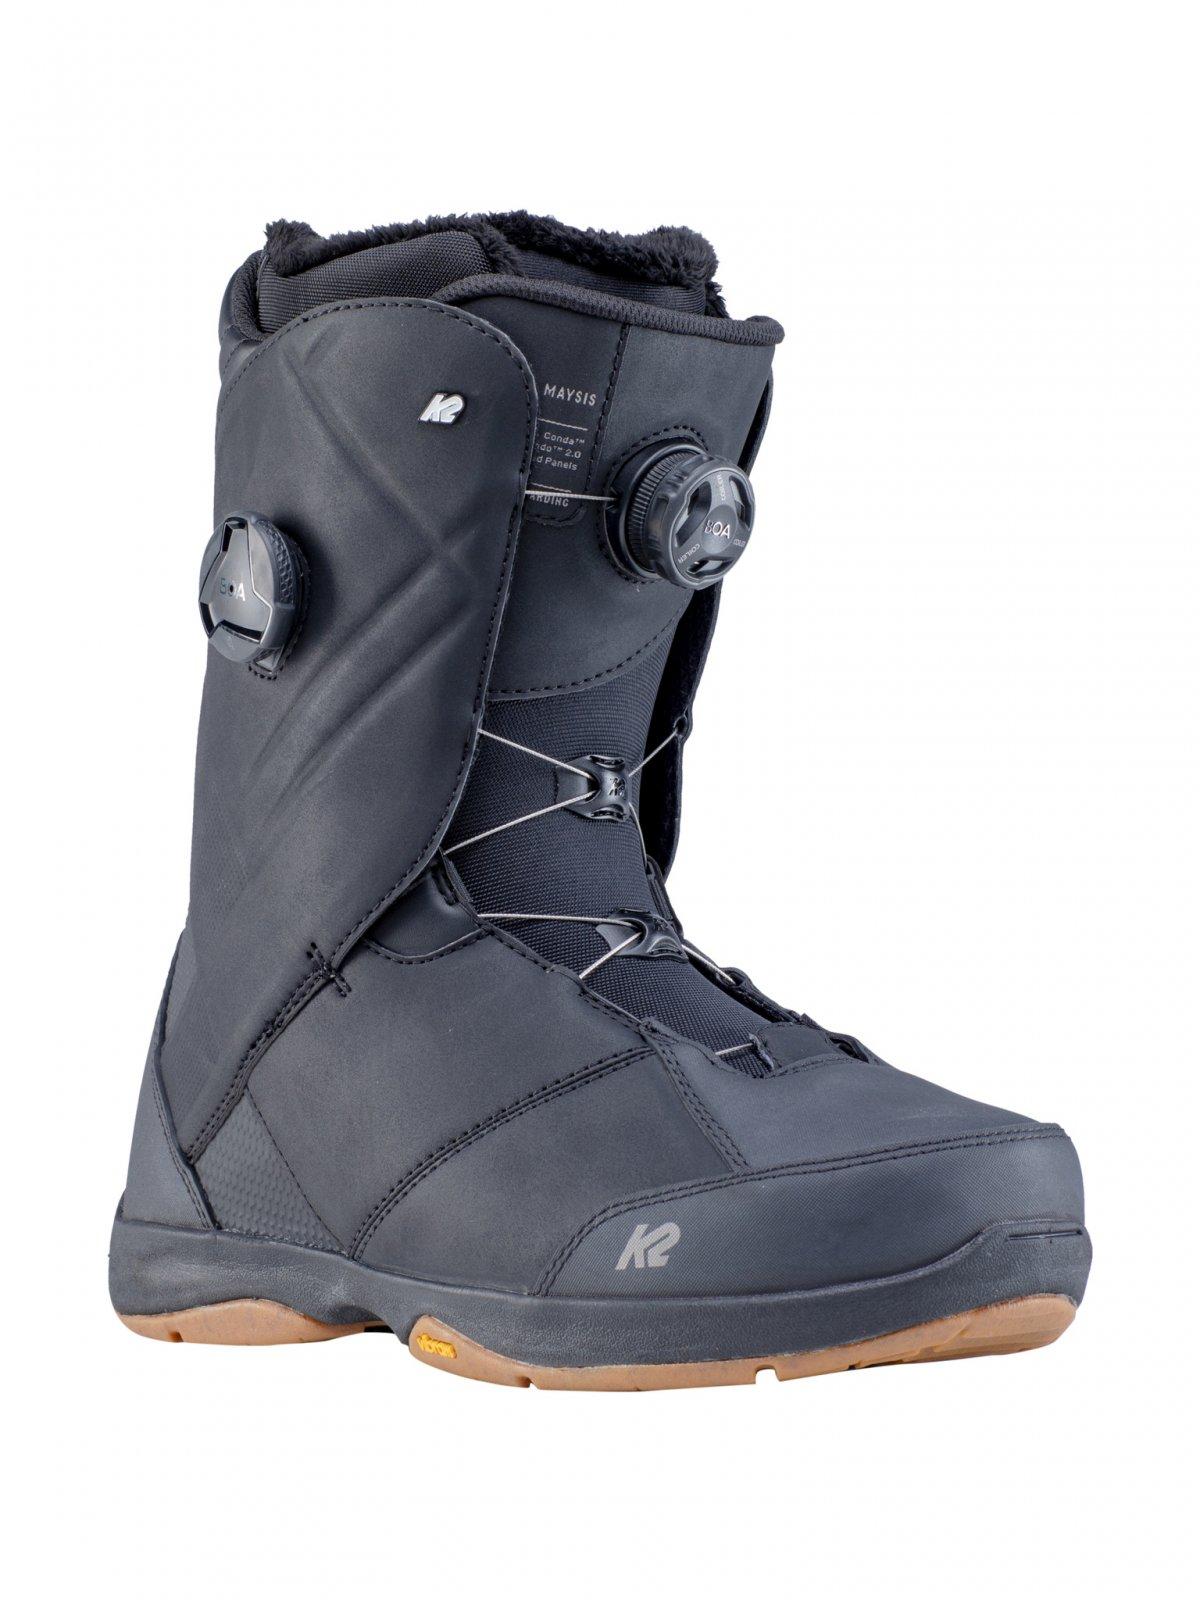 2020 K2 Maysis Men's Snowboard Boots